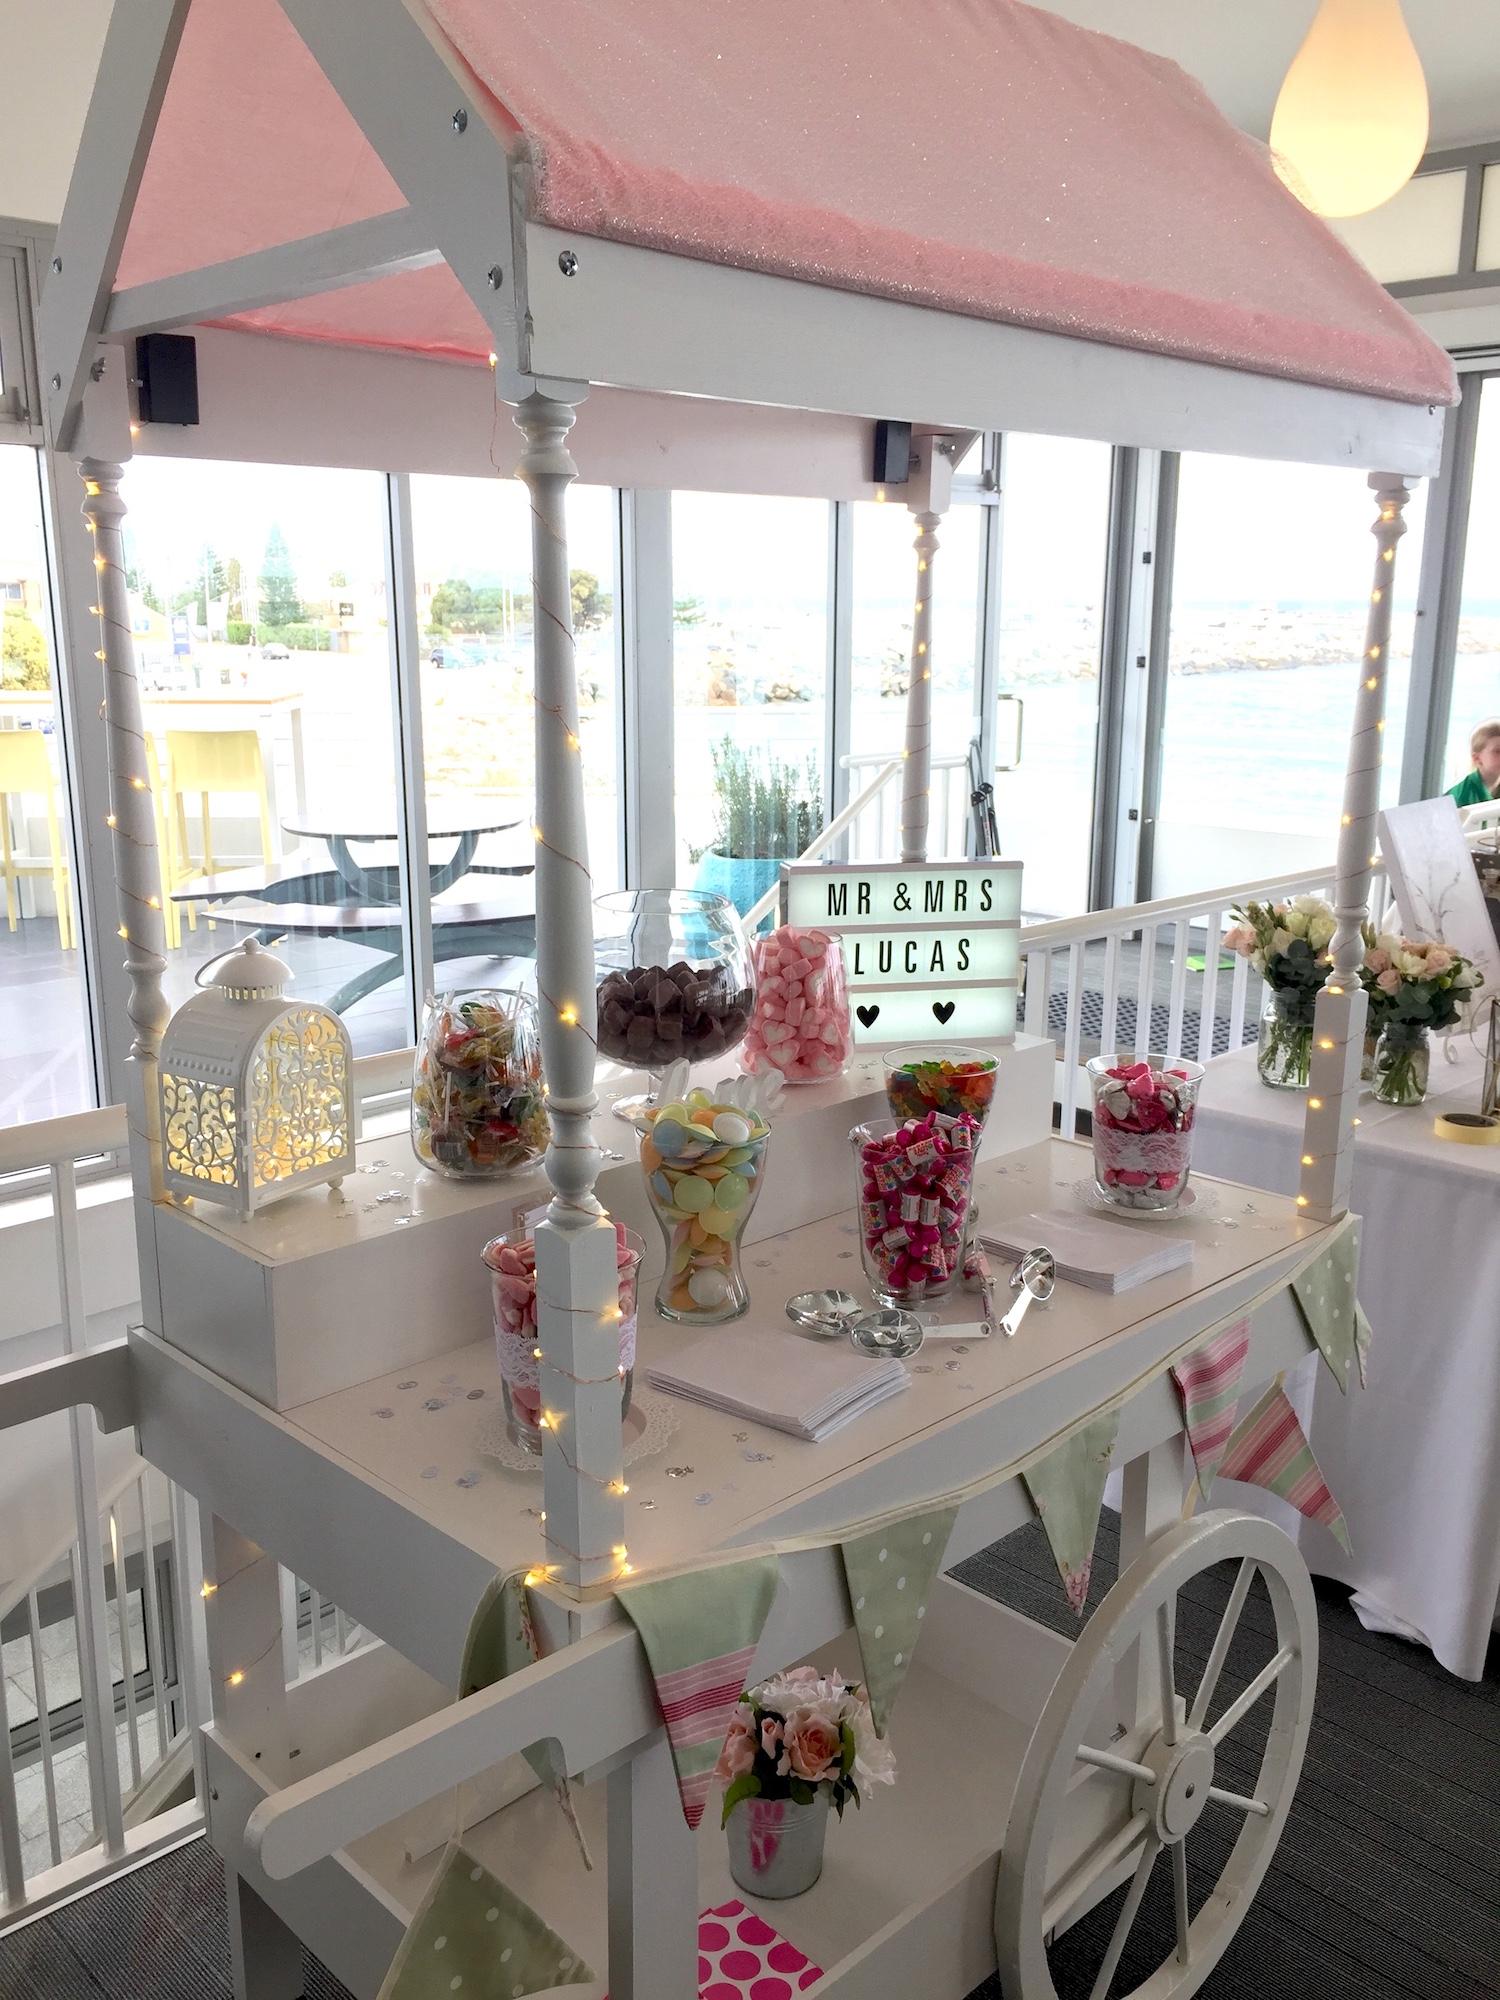 Little_Lolly_Cart_Bathers_Beach_Wedding_Perth_Side.jpeg